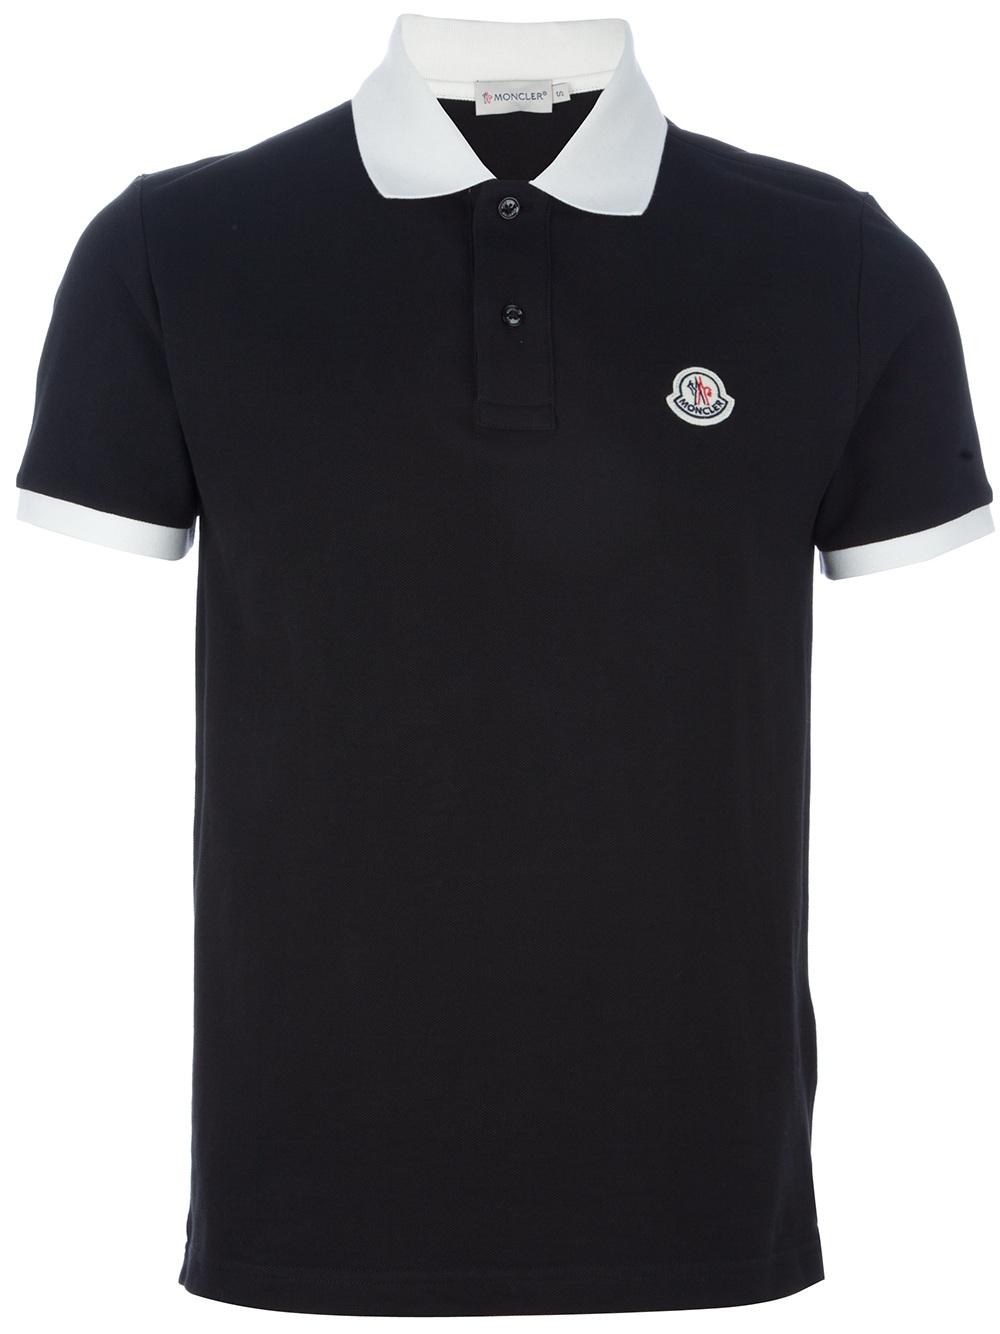 Lyst Moncler Polo Shirt In Black For Men